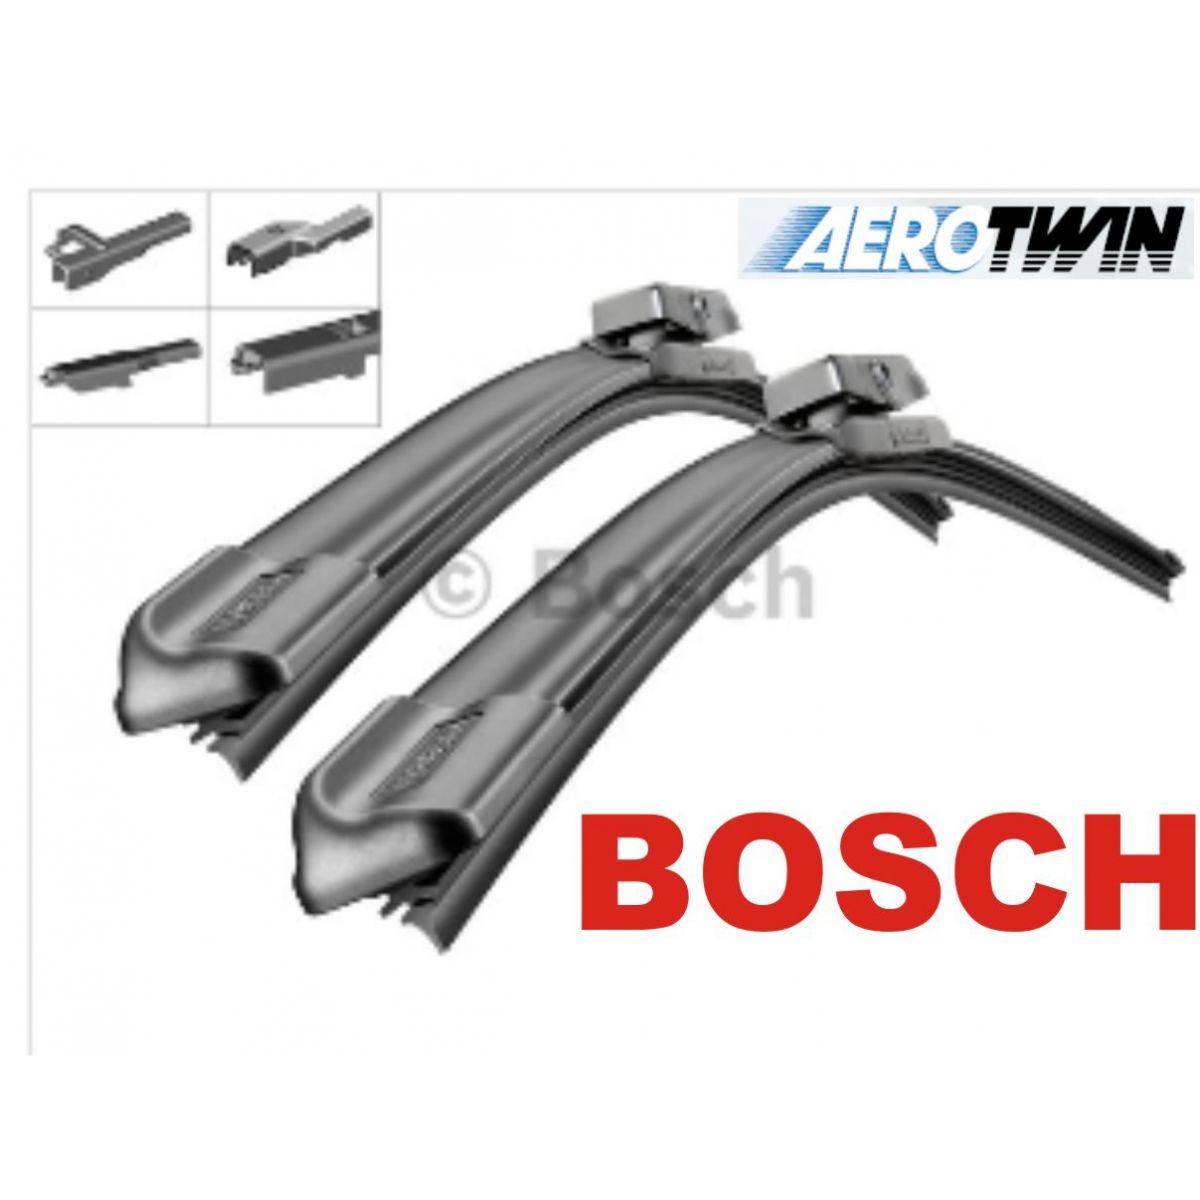 Palheta Bosch Aerotwin Plus Limpador de para brisa Bosch M3 Coupe [E 92] 2007 a 2009